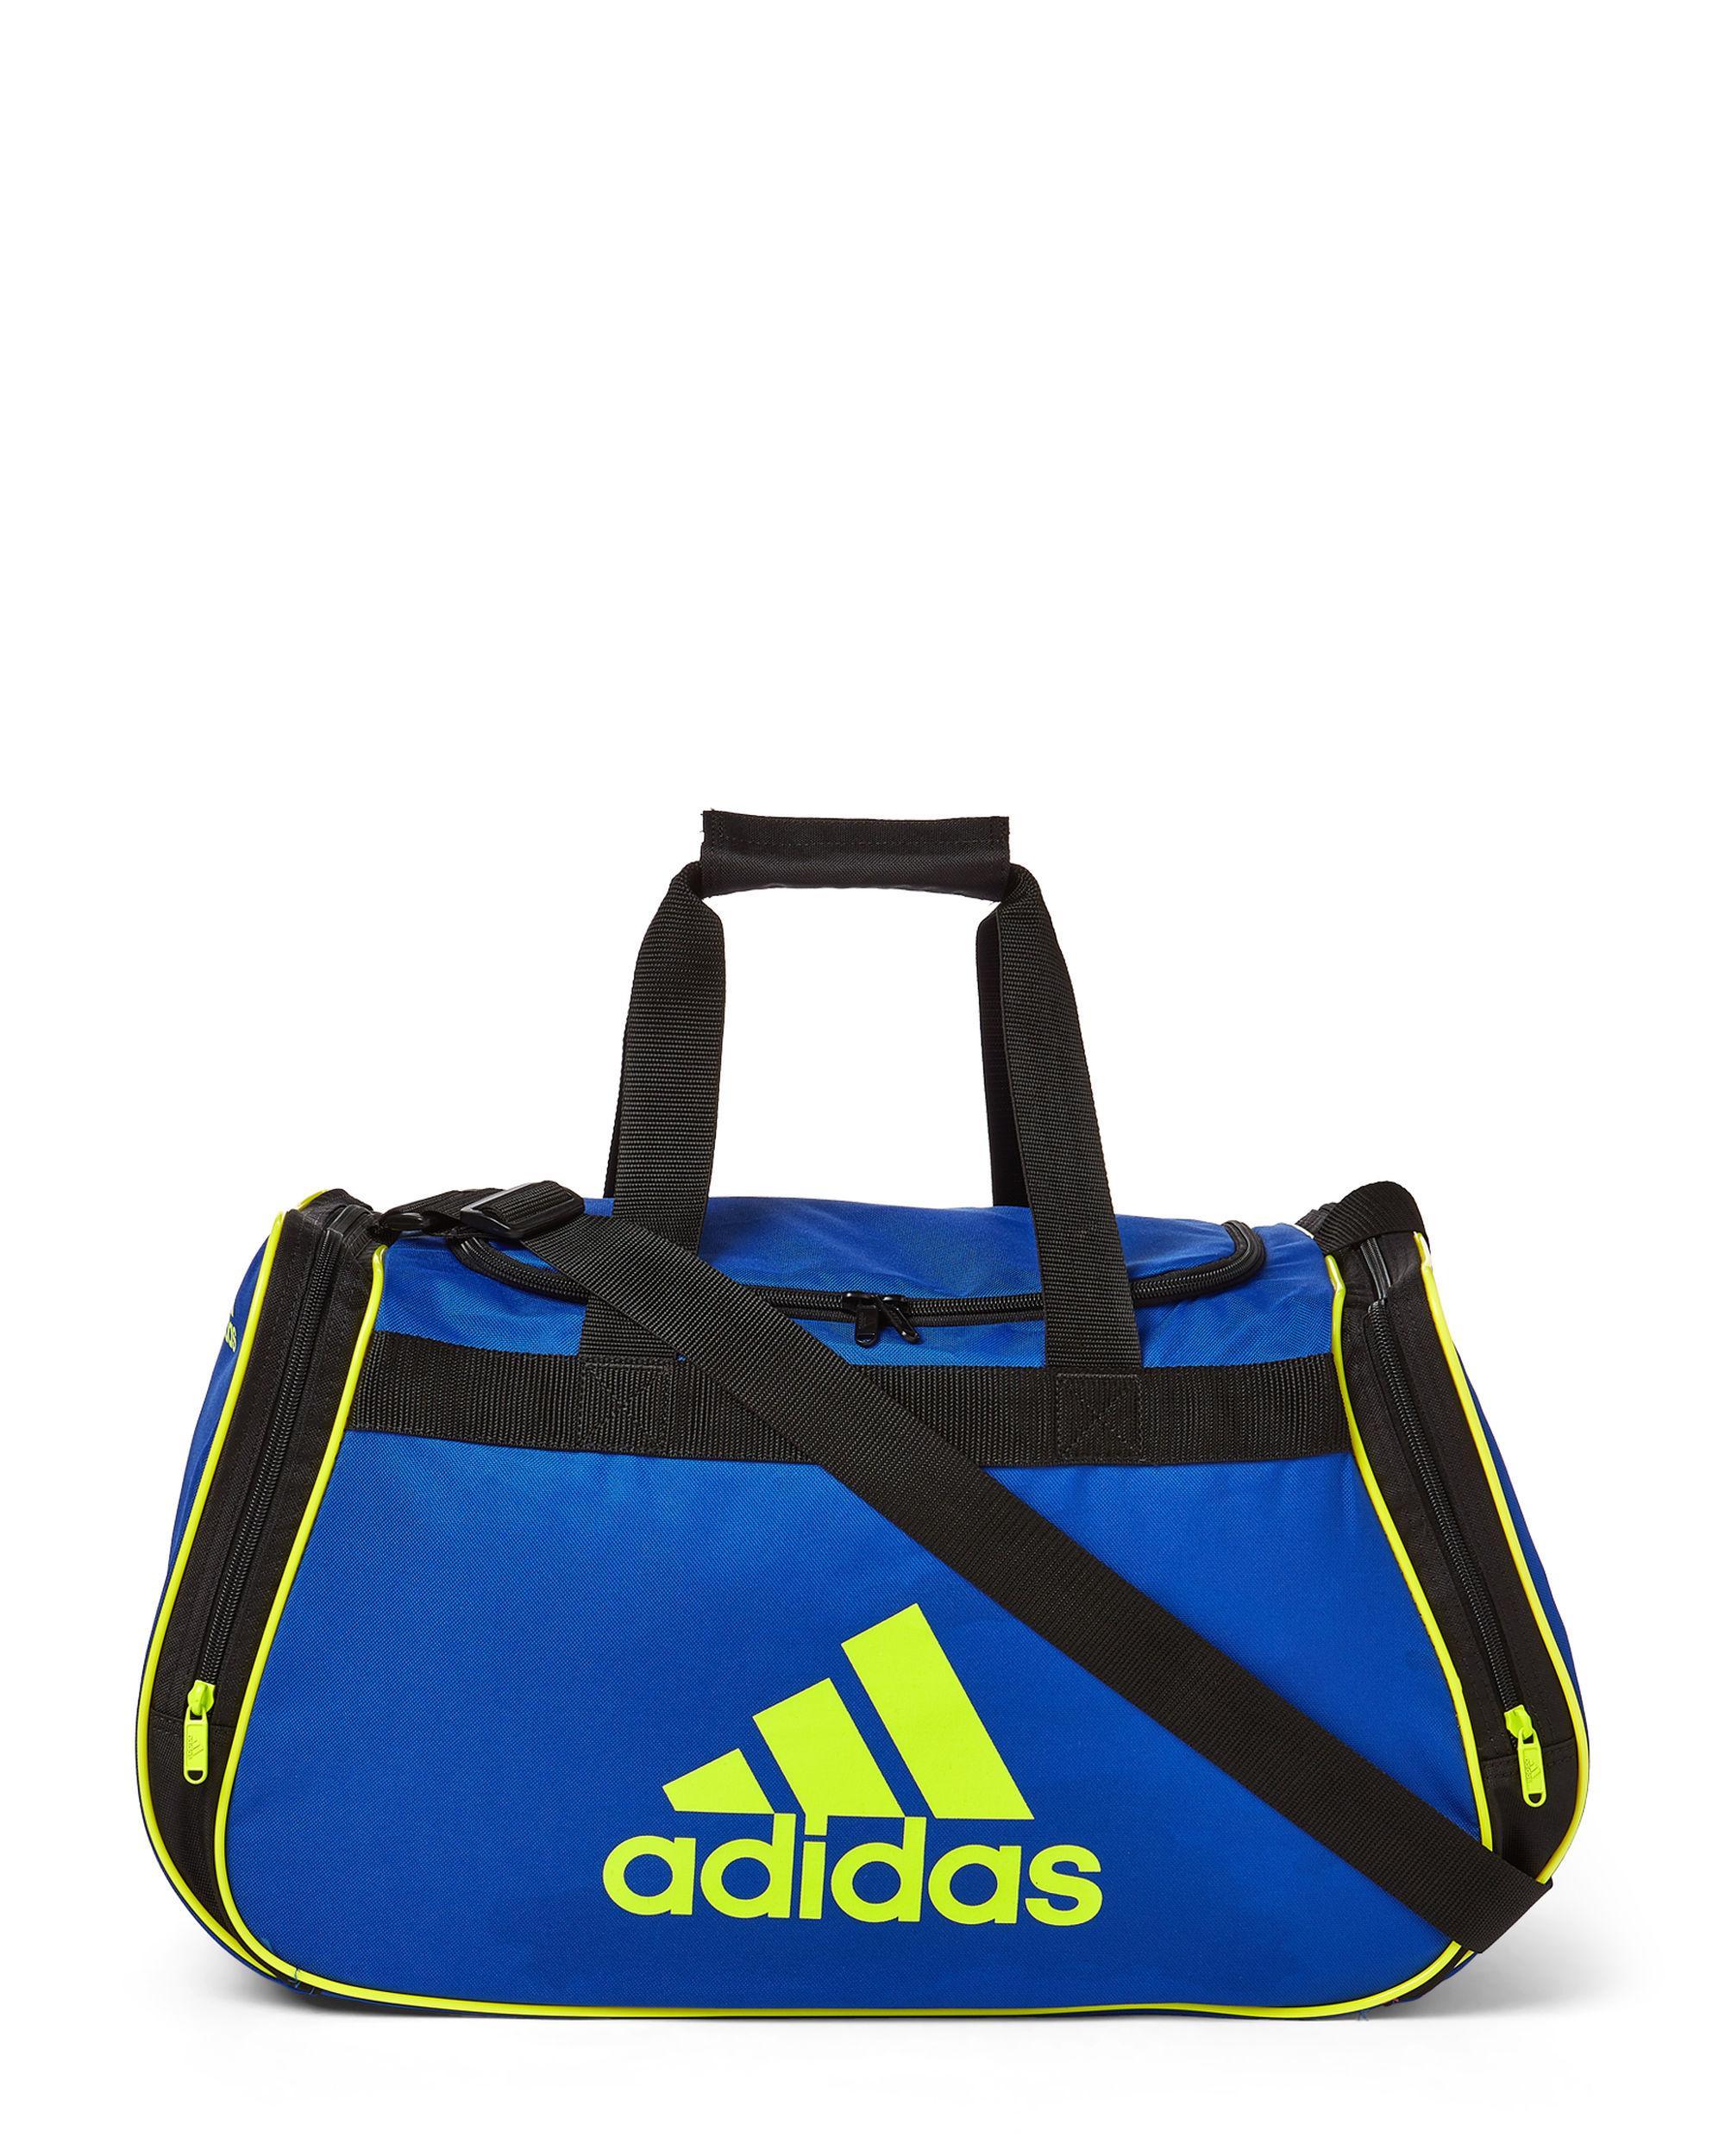 36a2b9f7958fb4 Adidas - Blue Cobalt & Electric City Diablo Ii Medium Duffel for Men -  Lyst. View fullscreen